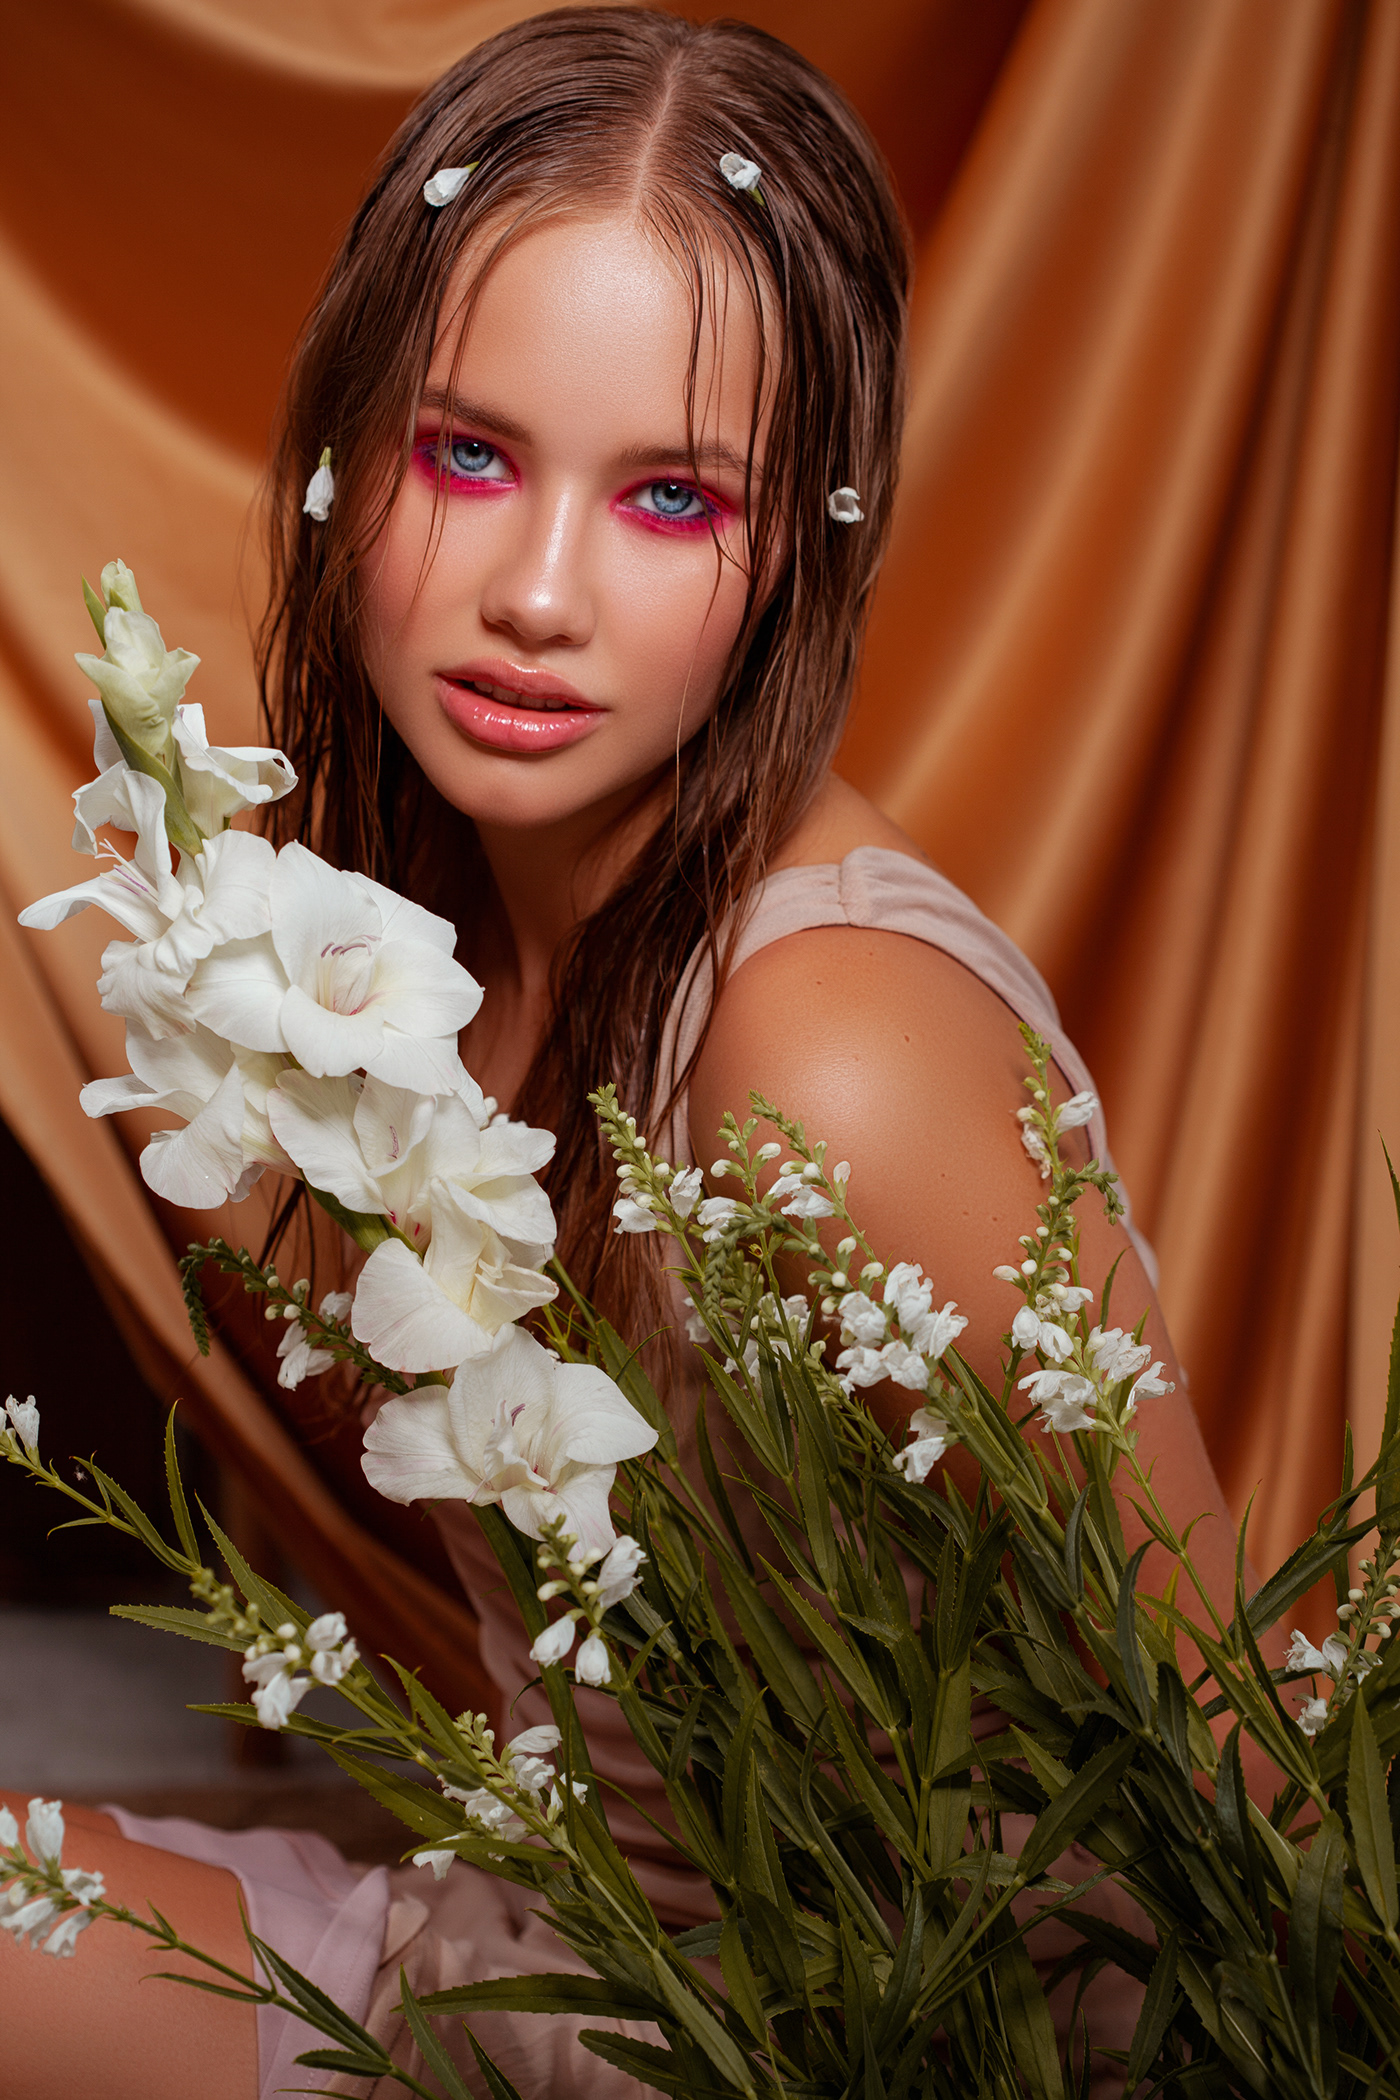 beauty BeforeAfter close up Make Up MUA photoshop retouch retoucher retouching